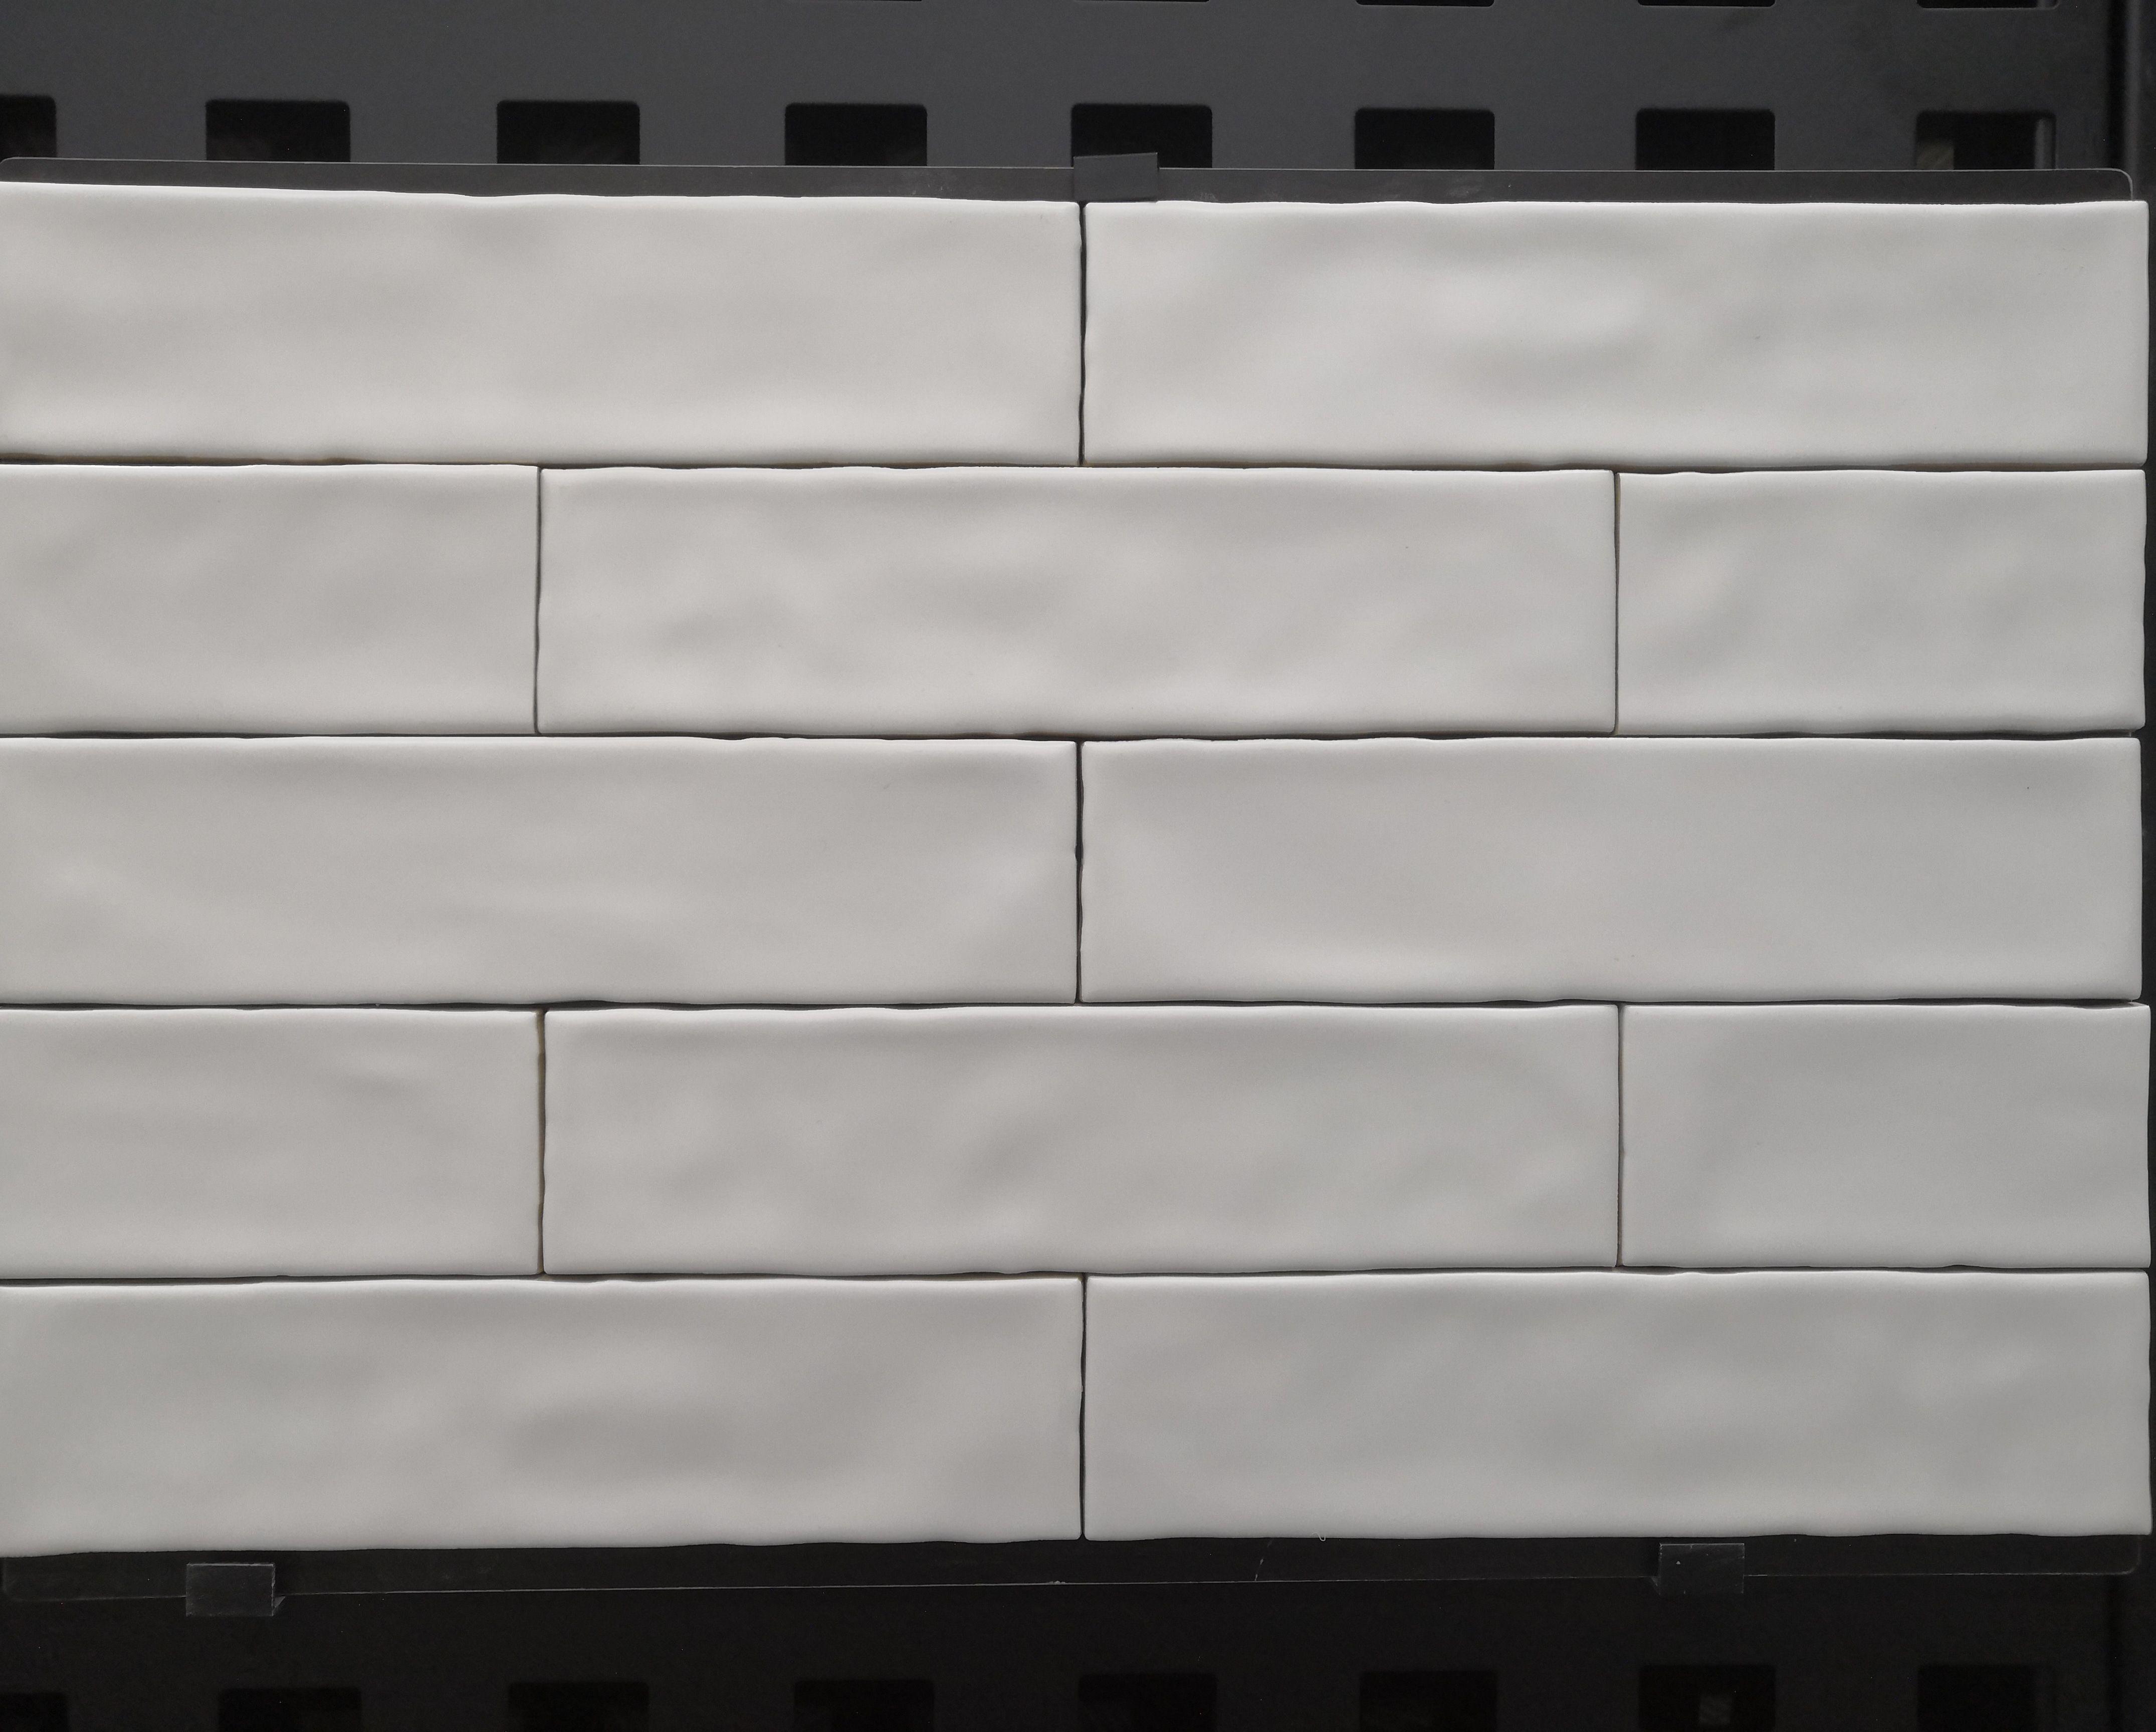 Wavy Edge Subway Tile Subway Tile Ceramic Wall Tiles Handmade Tiles